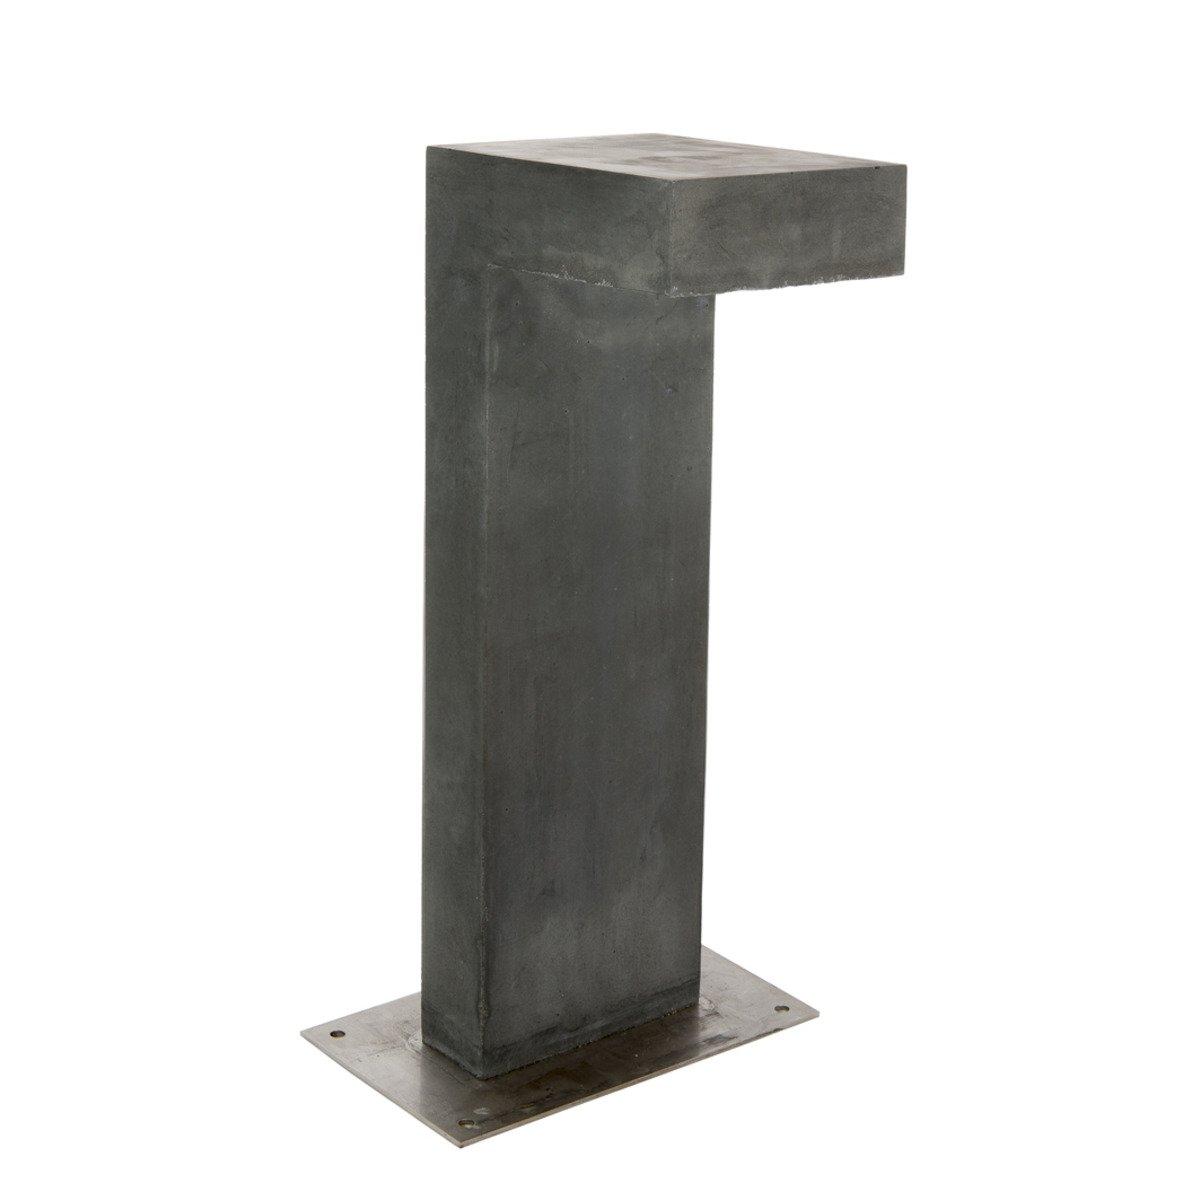 Concrete Collection Lighting - Bullard Bollards (7)